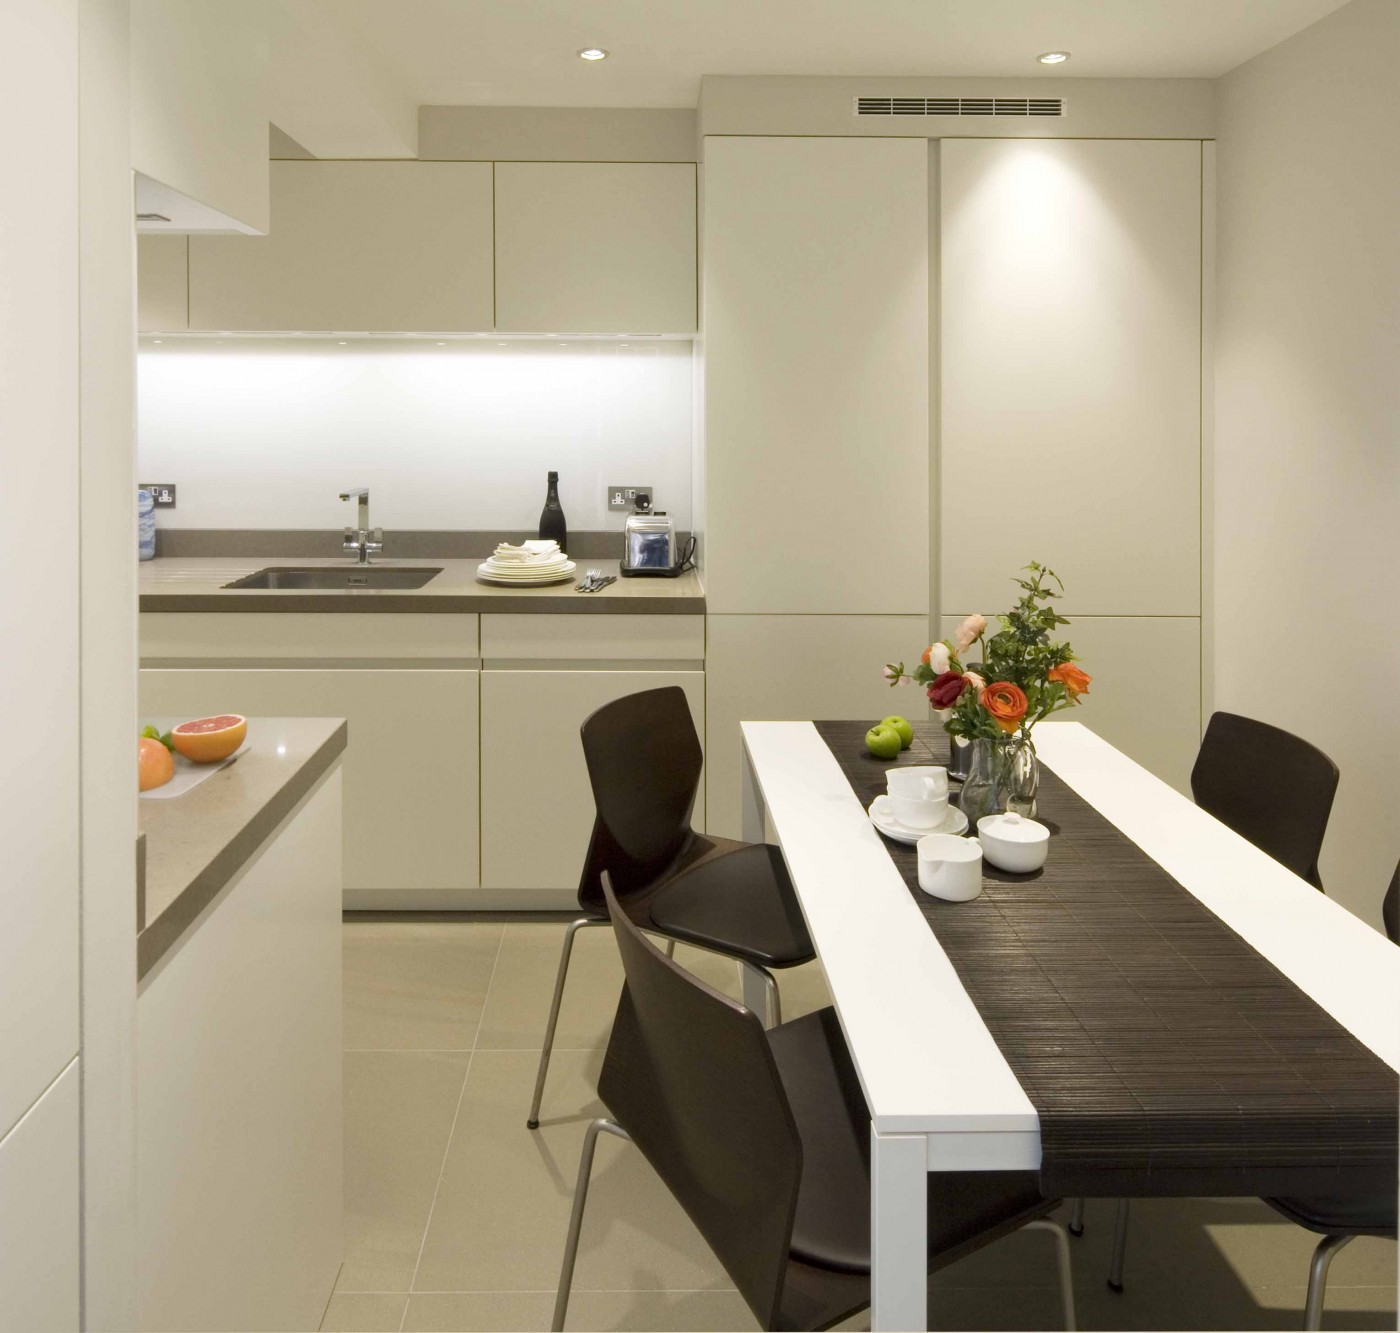 Sloane Street Apartments: Kitchen Transformation In Sloane Street, Knightsbridge, London